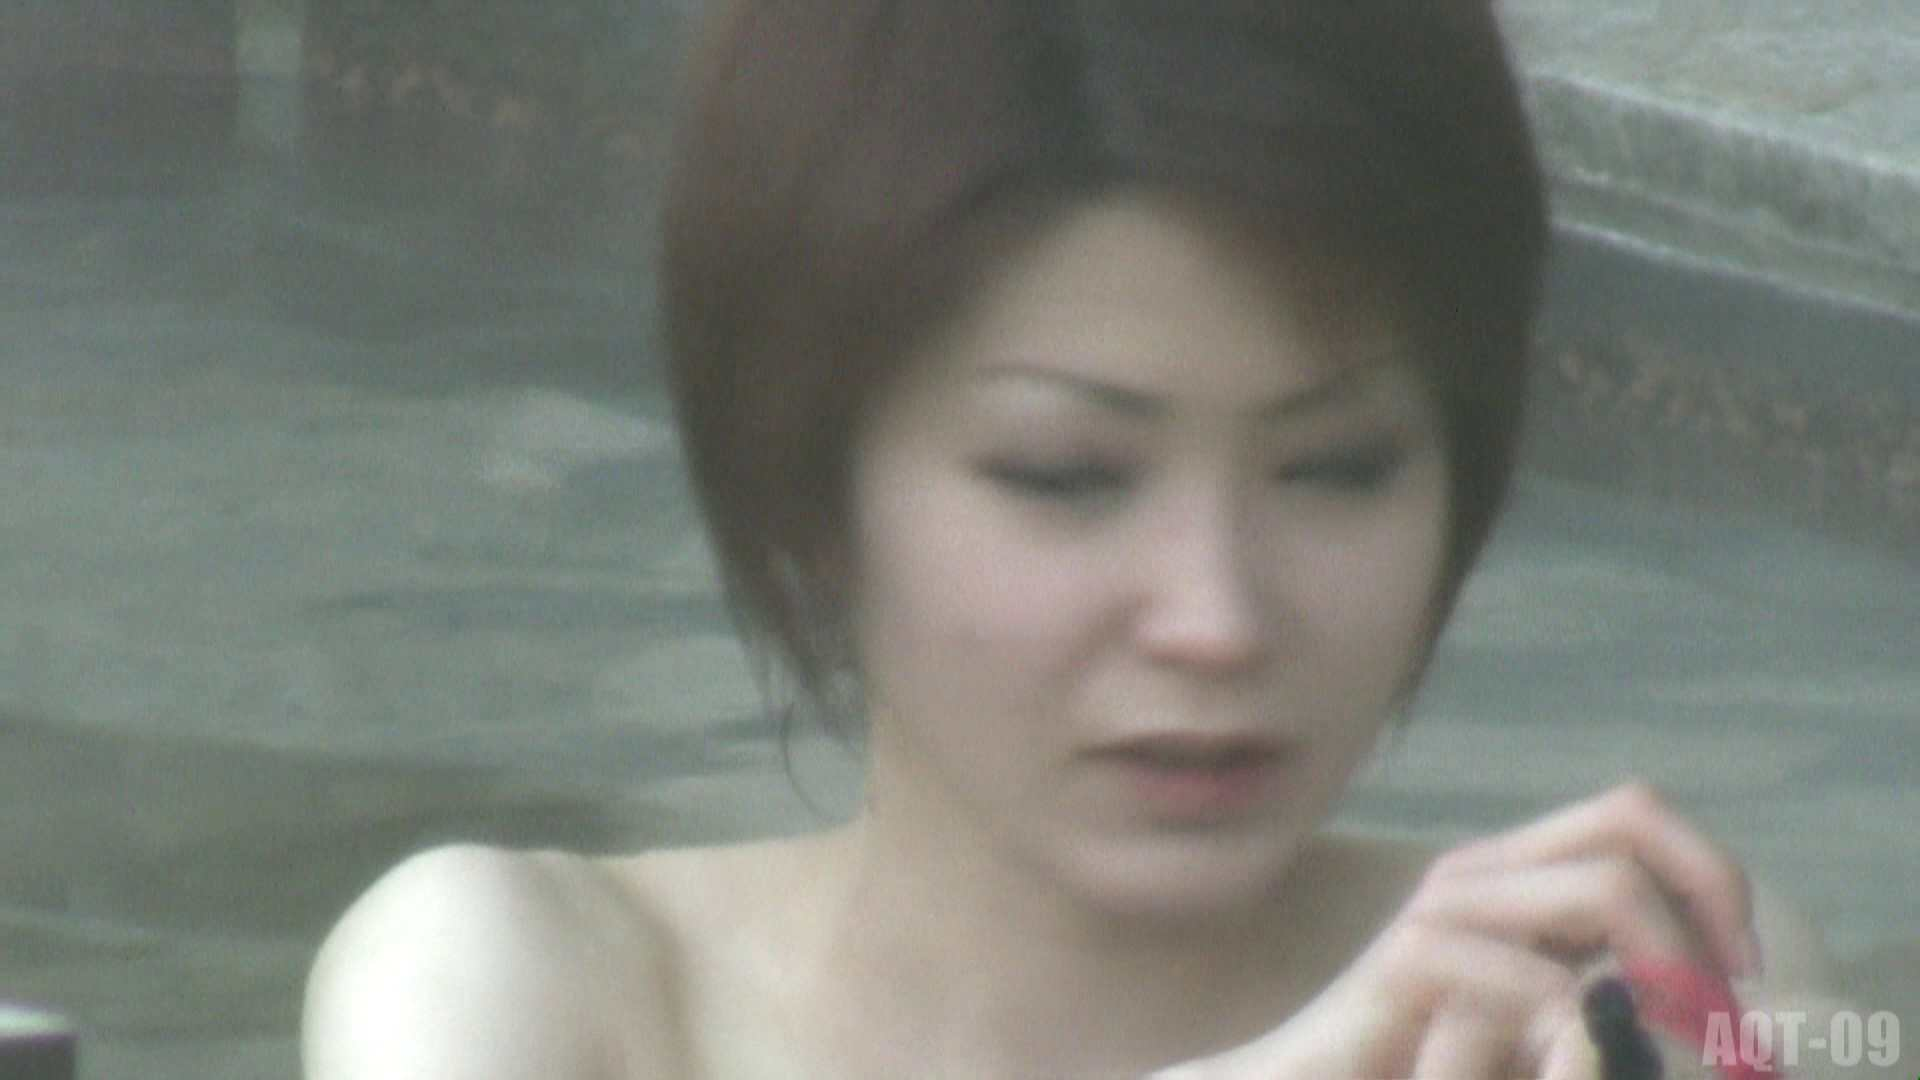 Aquaな露天風呂Vol.779 露天風呂 | OLのエロ生活  81連発 10